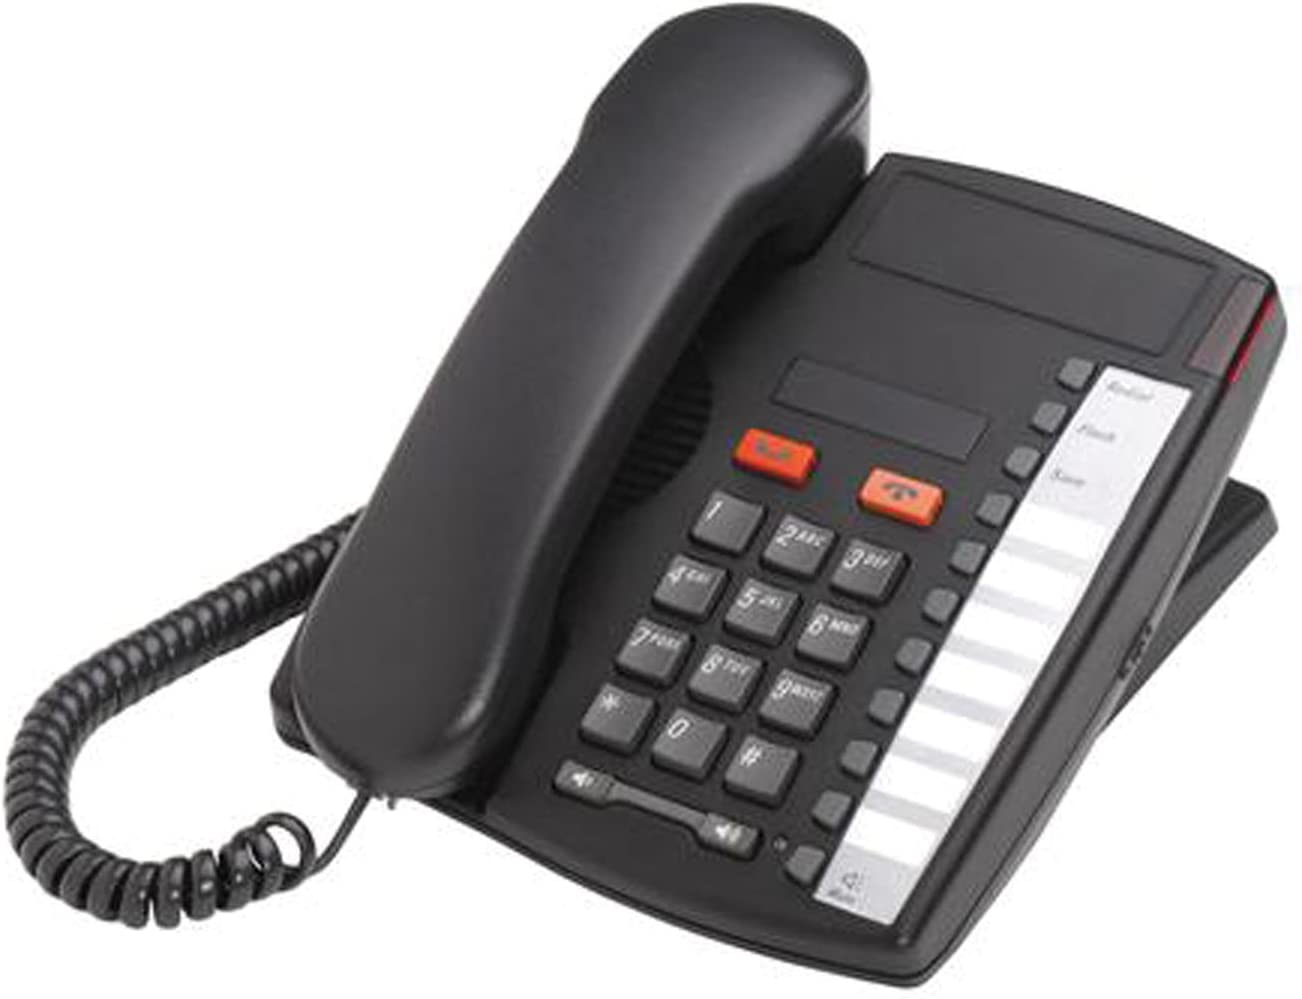 Lot of 10 Aastra 9116 Wall Speaker Caller ID Corded Phone Analog Nortel